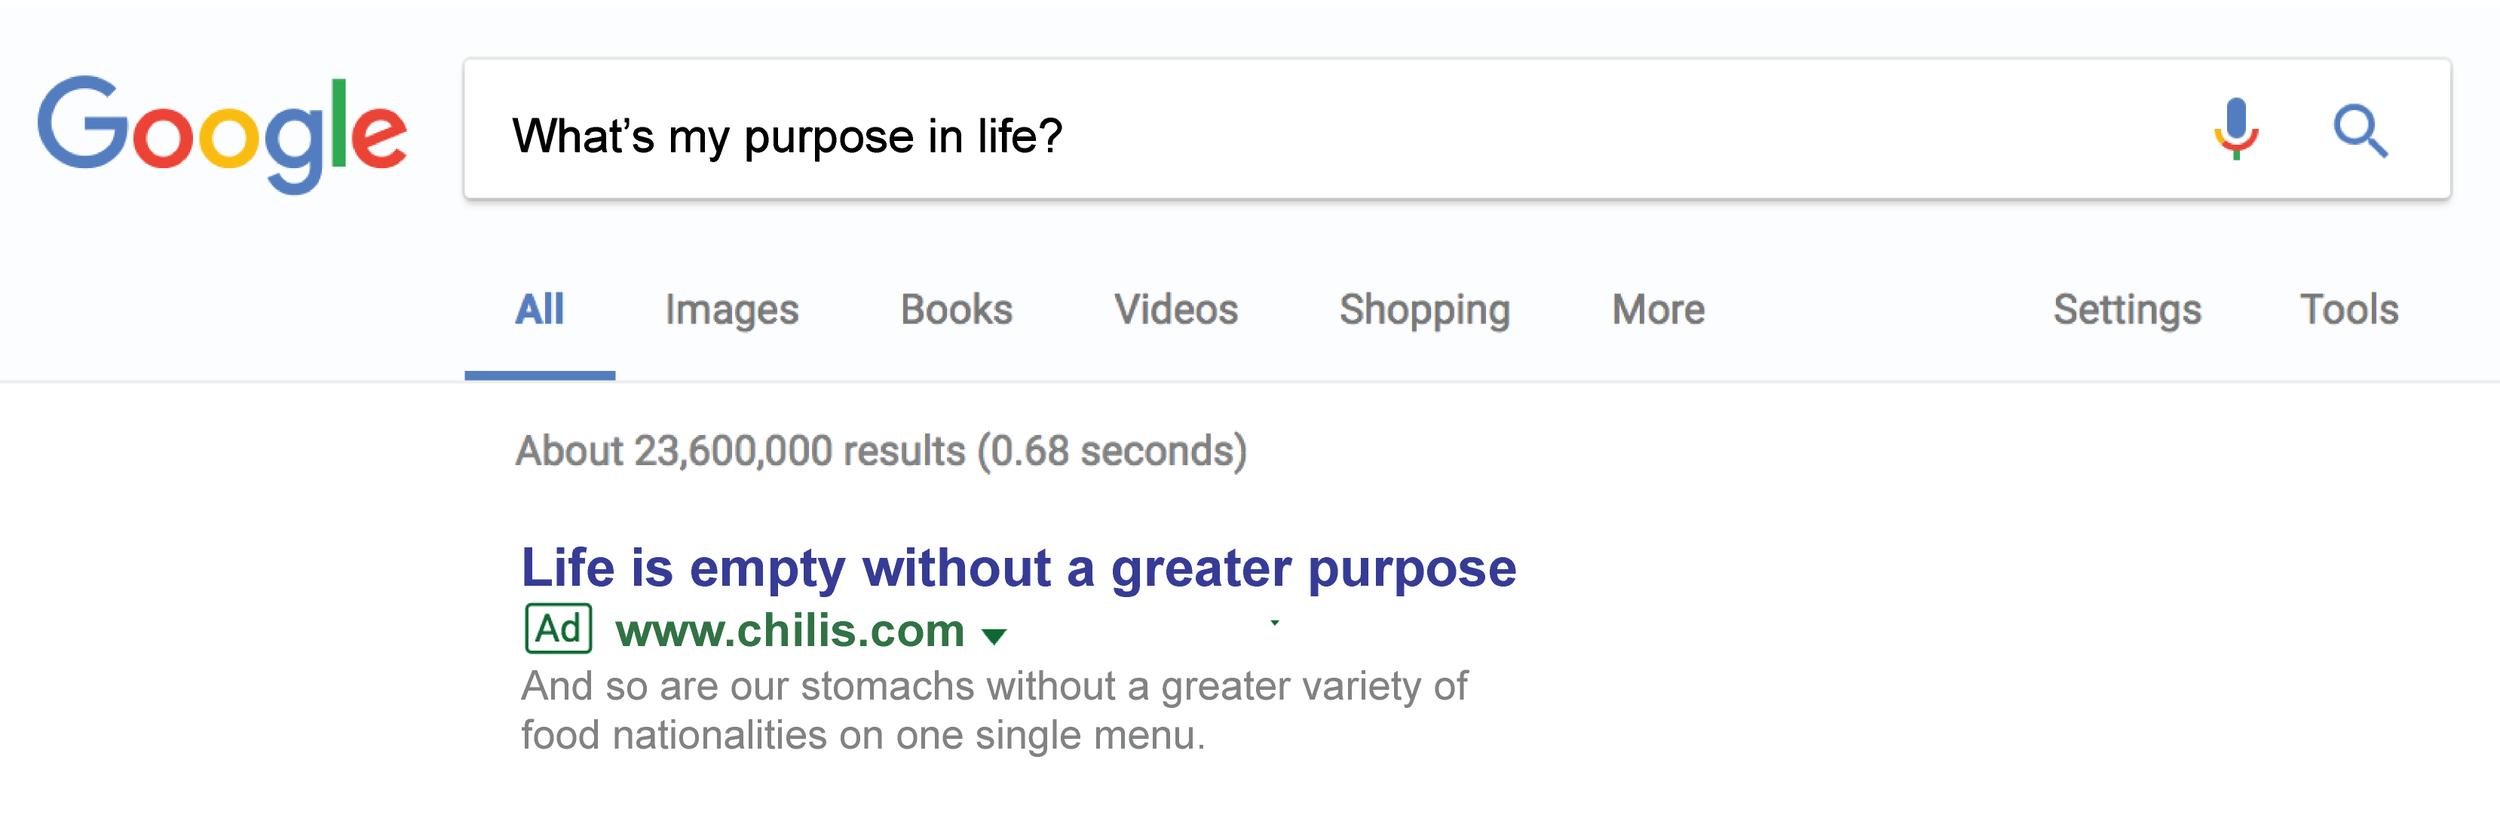 Chili's Google Ads1-01.png